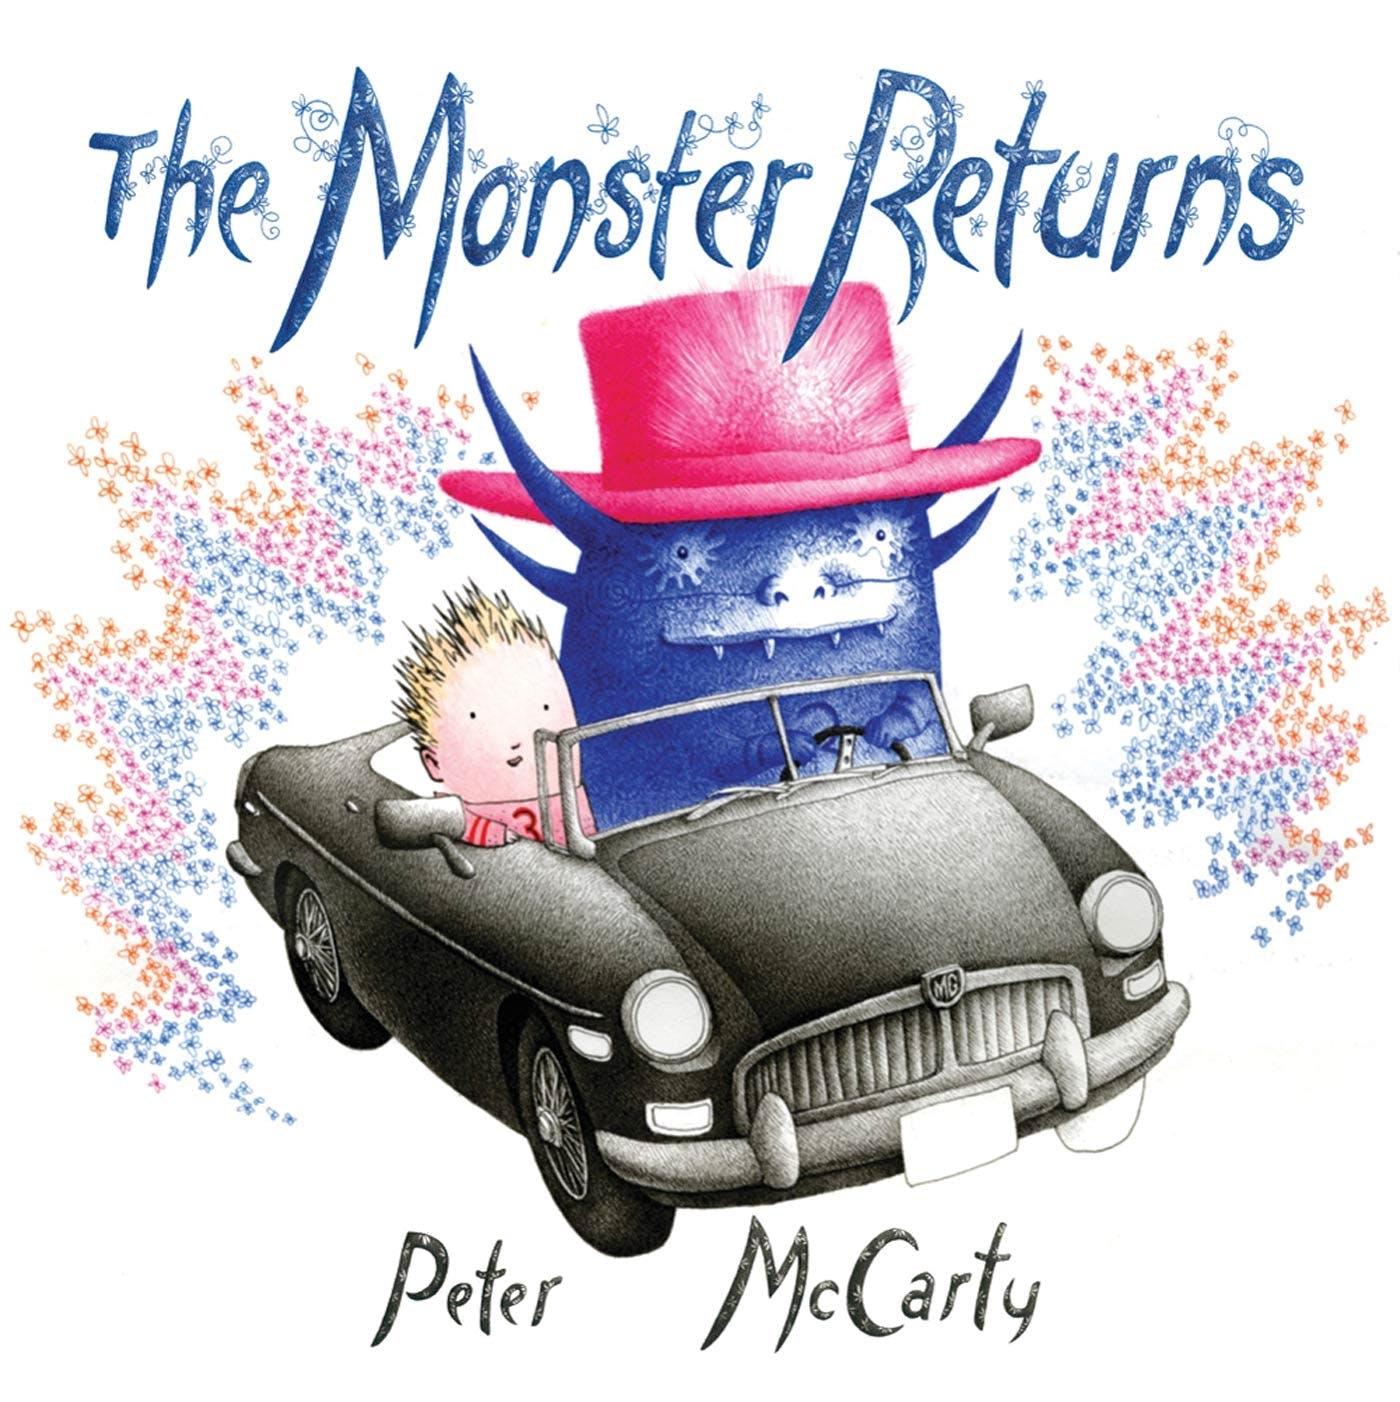 Image of The Monster Returns